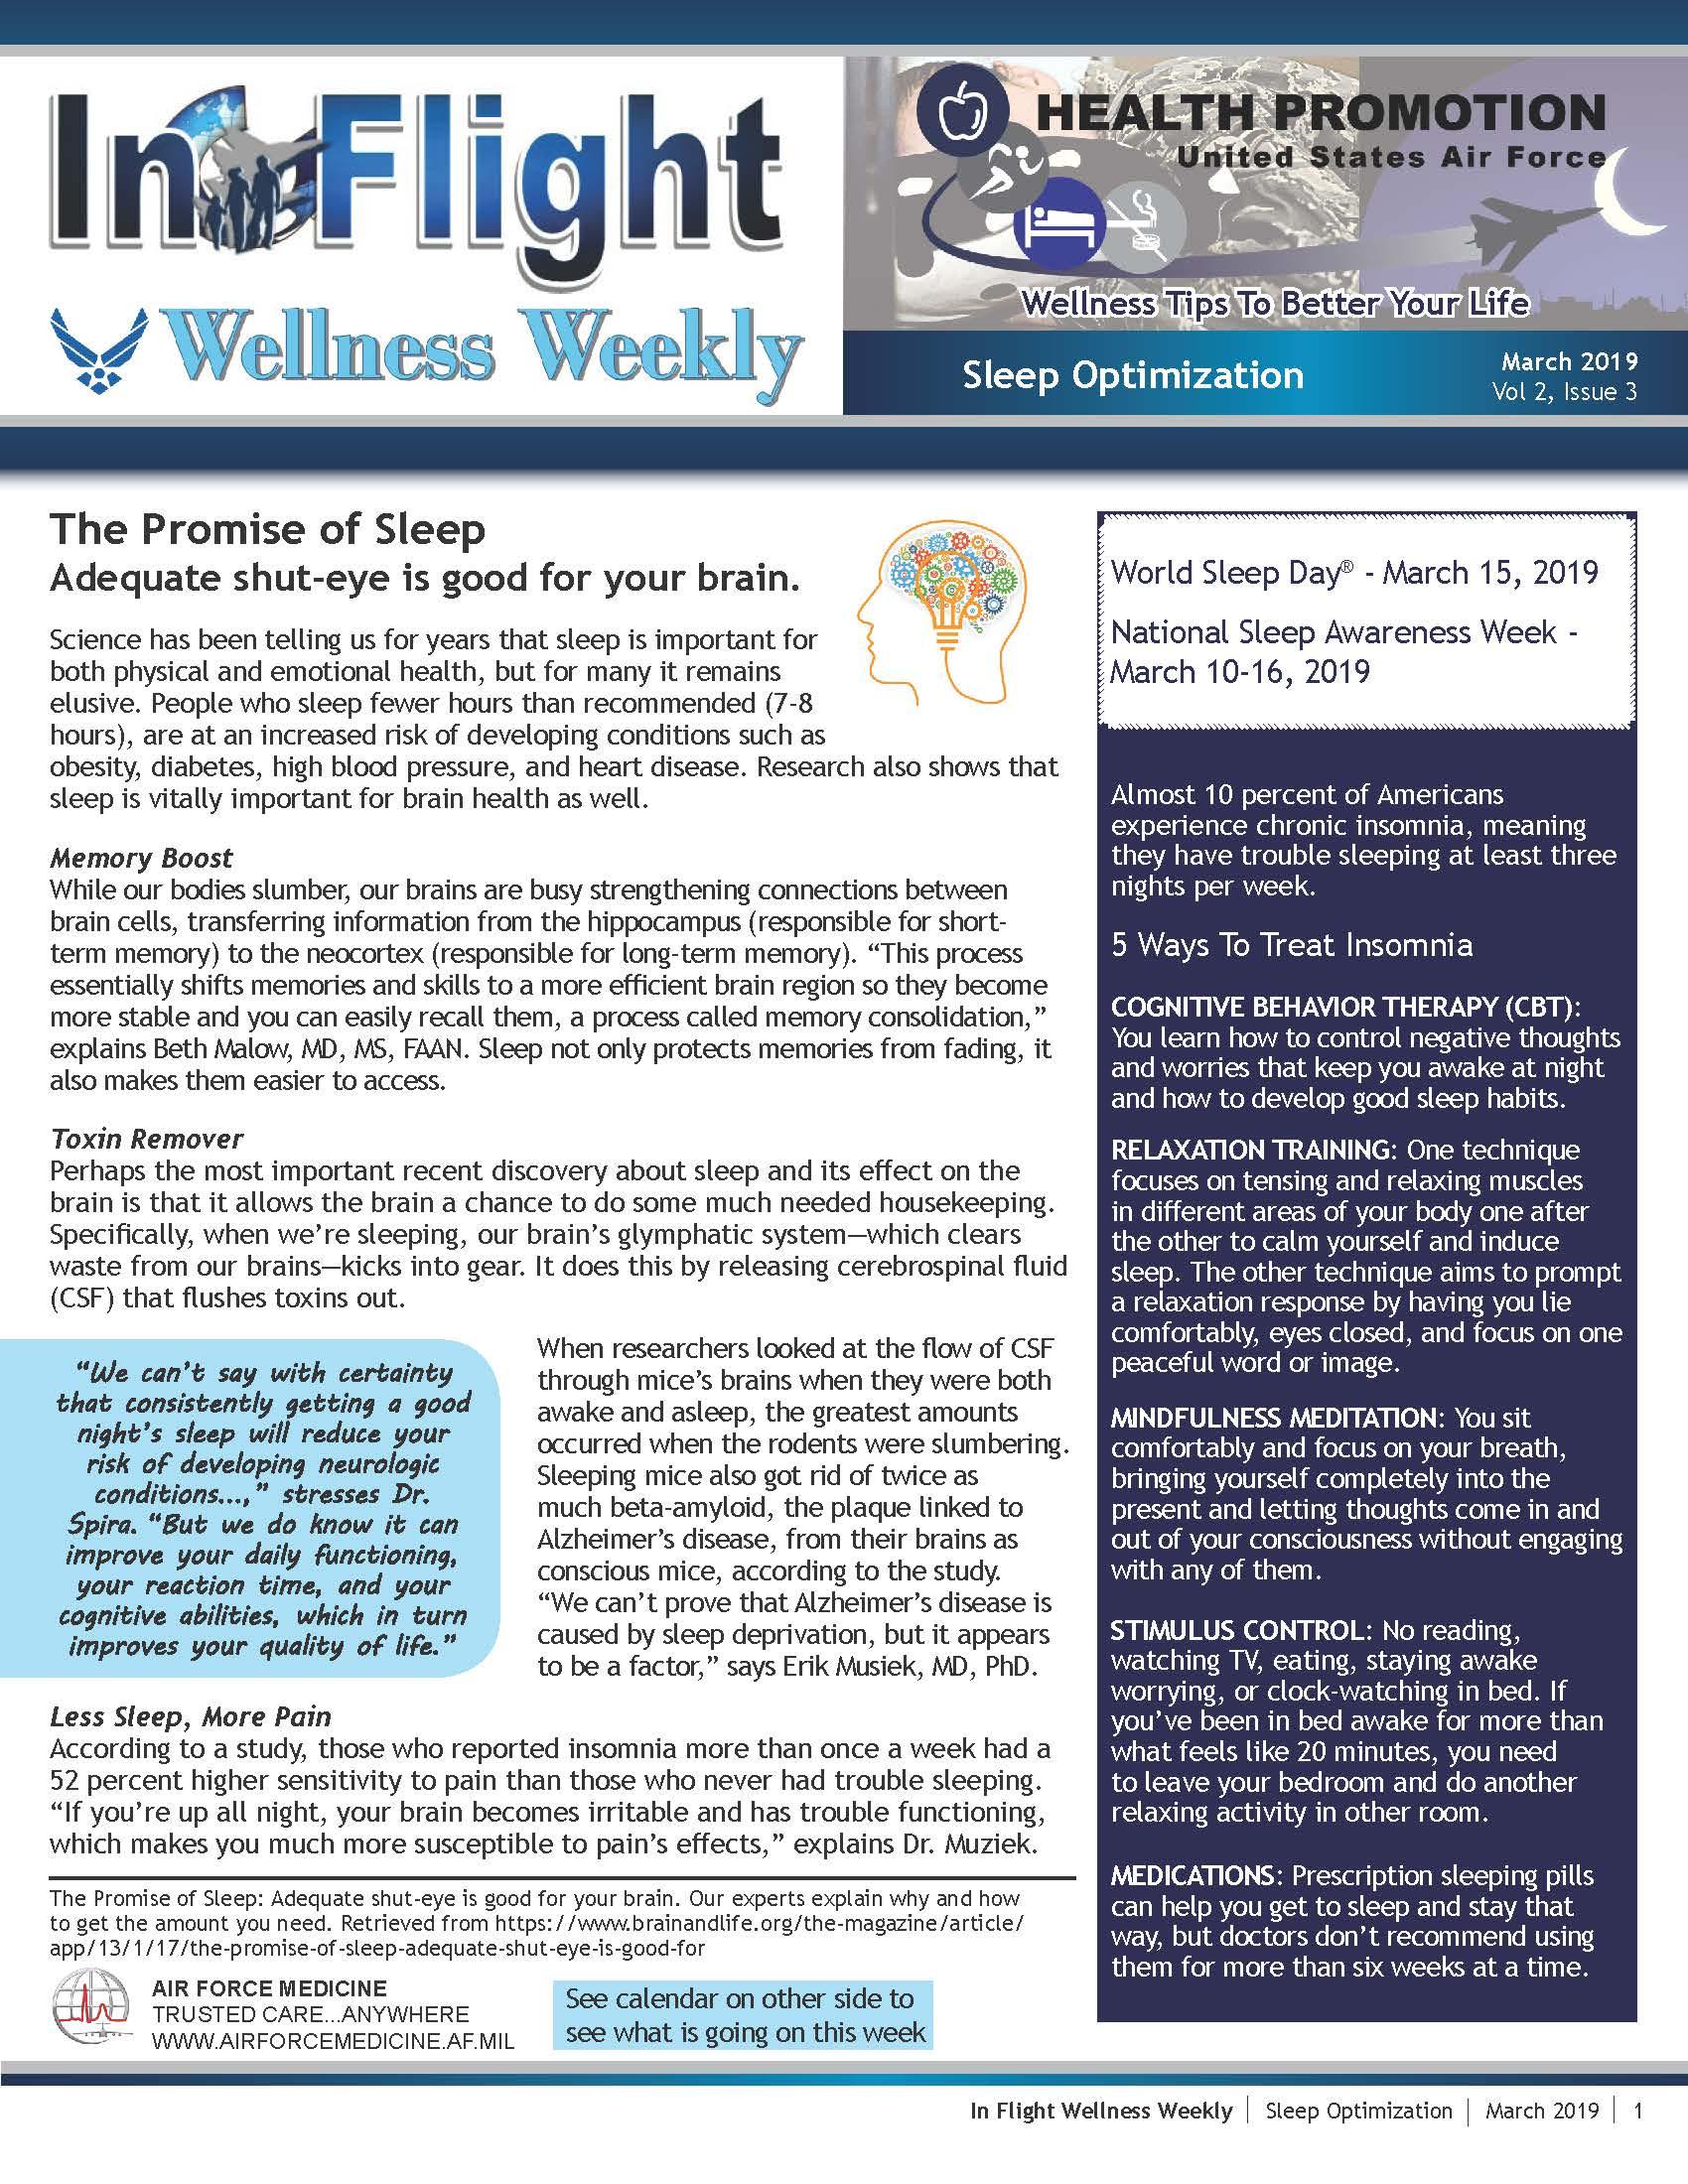 Health Promotion Wellness Weekly 4 - Sleep Optimization